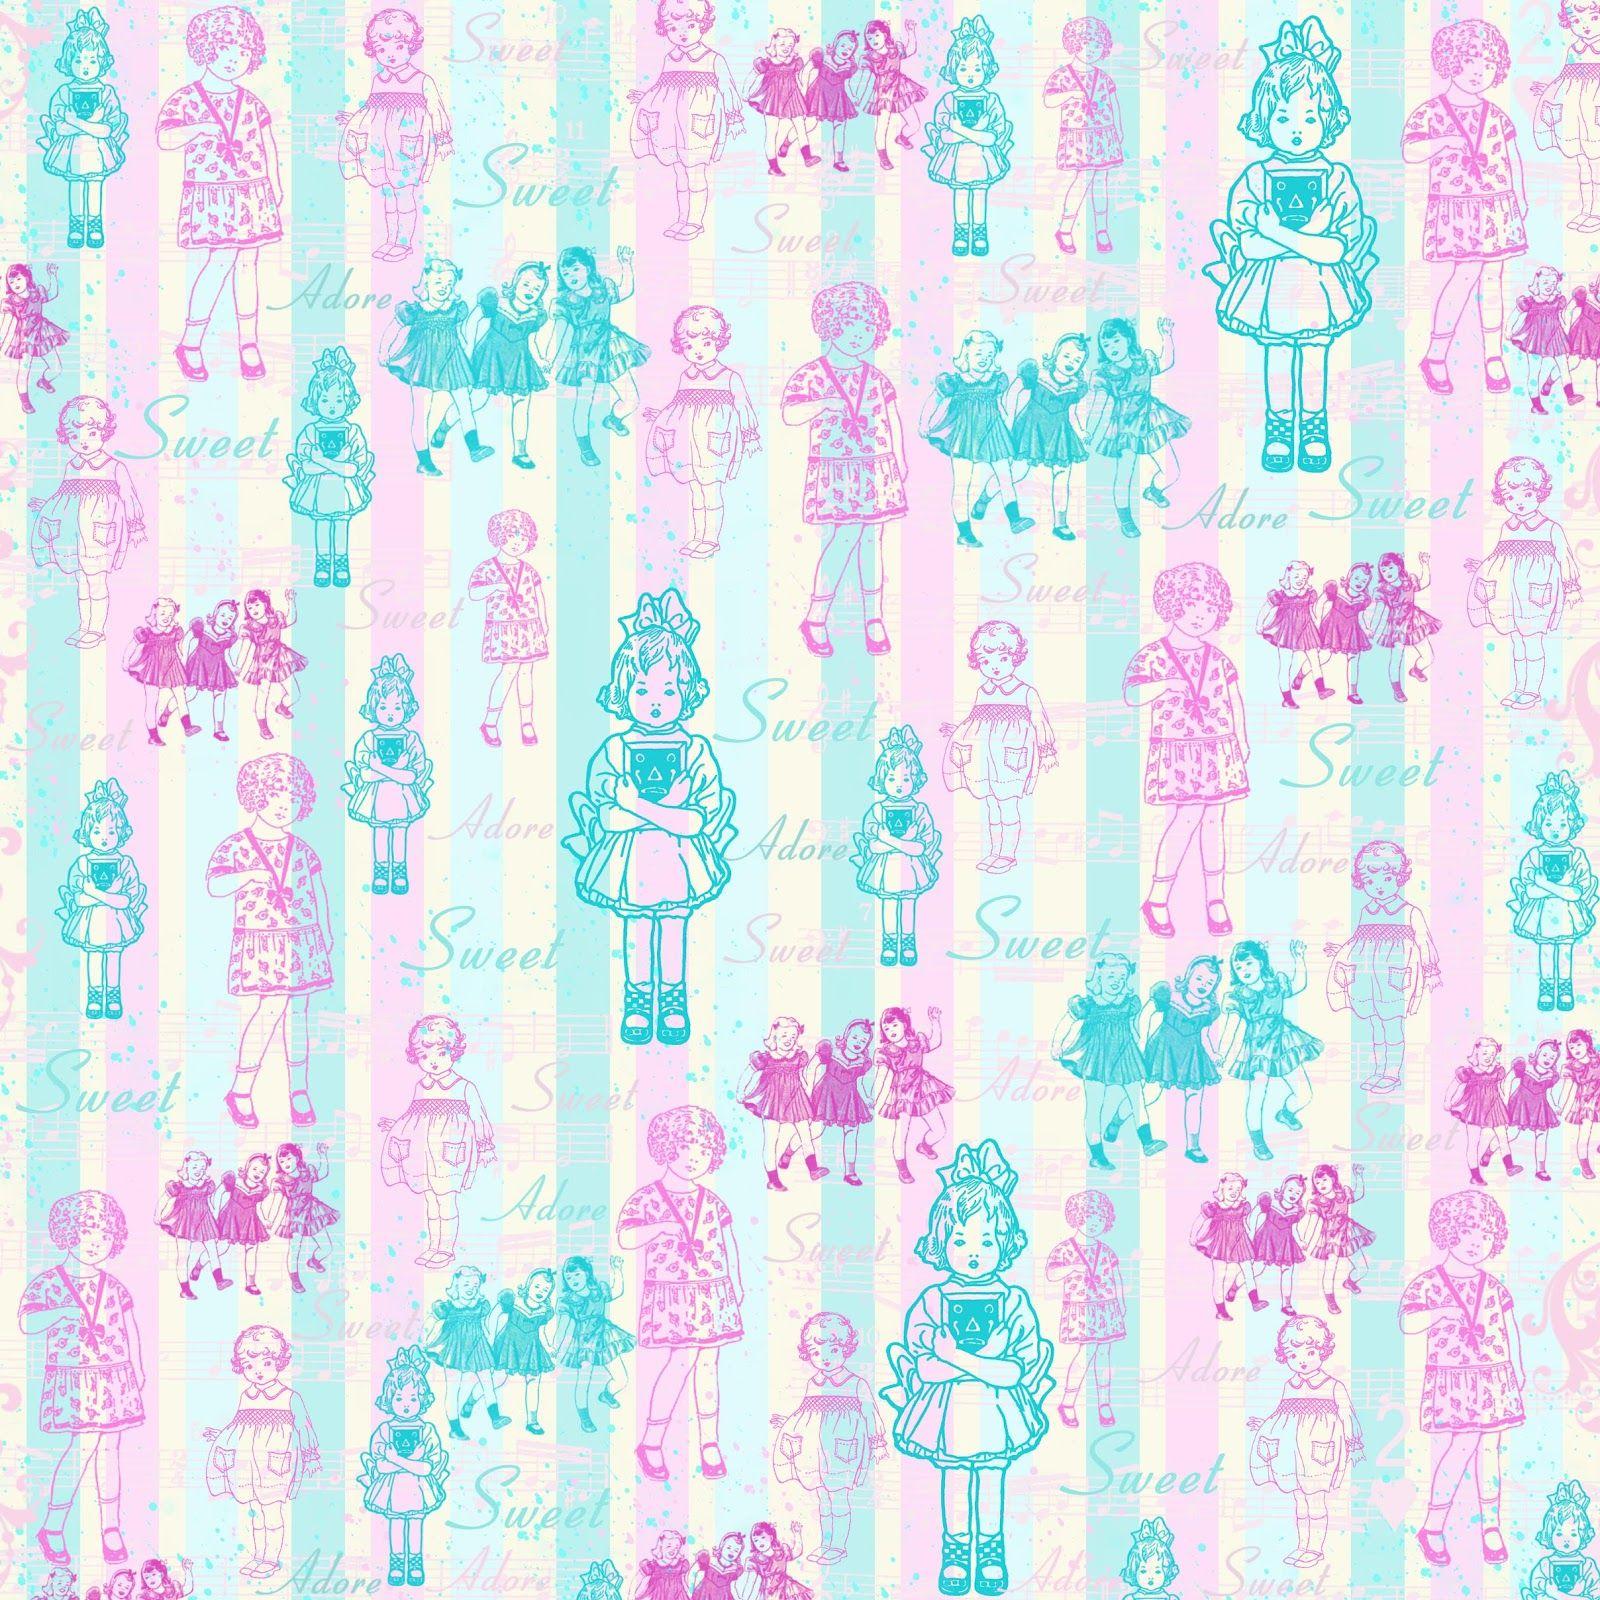 Scrapbook paper as wallpaper - Free Digital Scrapbook Paper Pink Blue